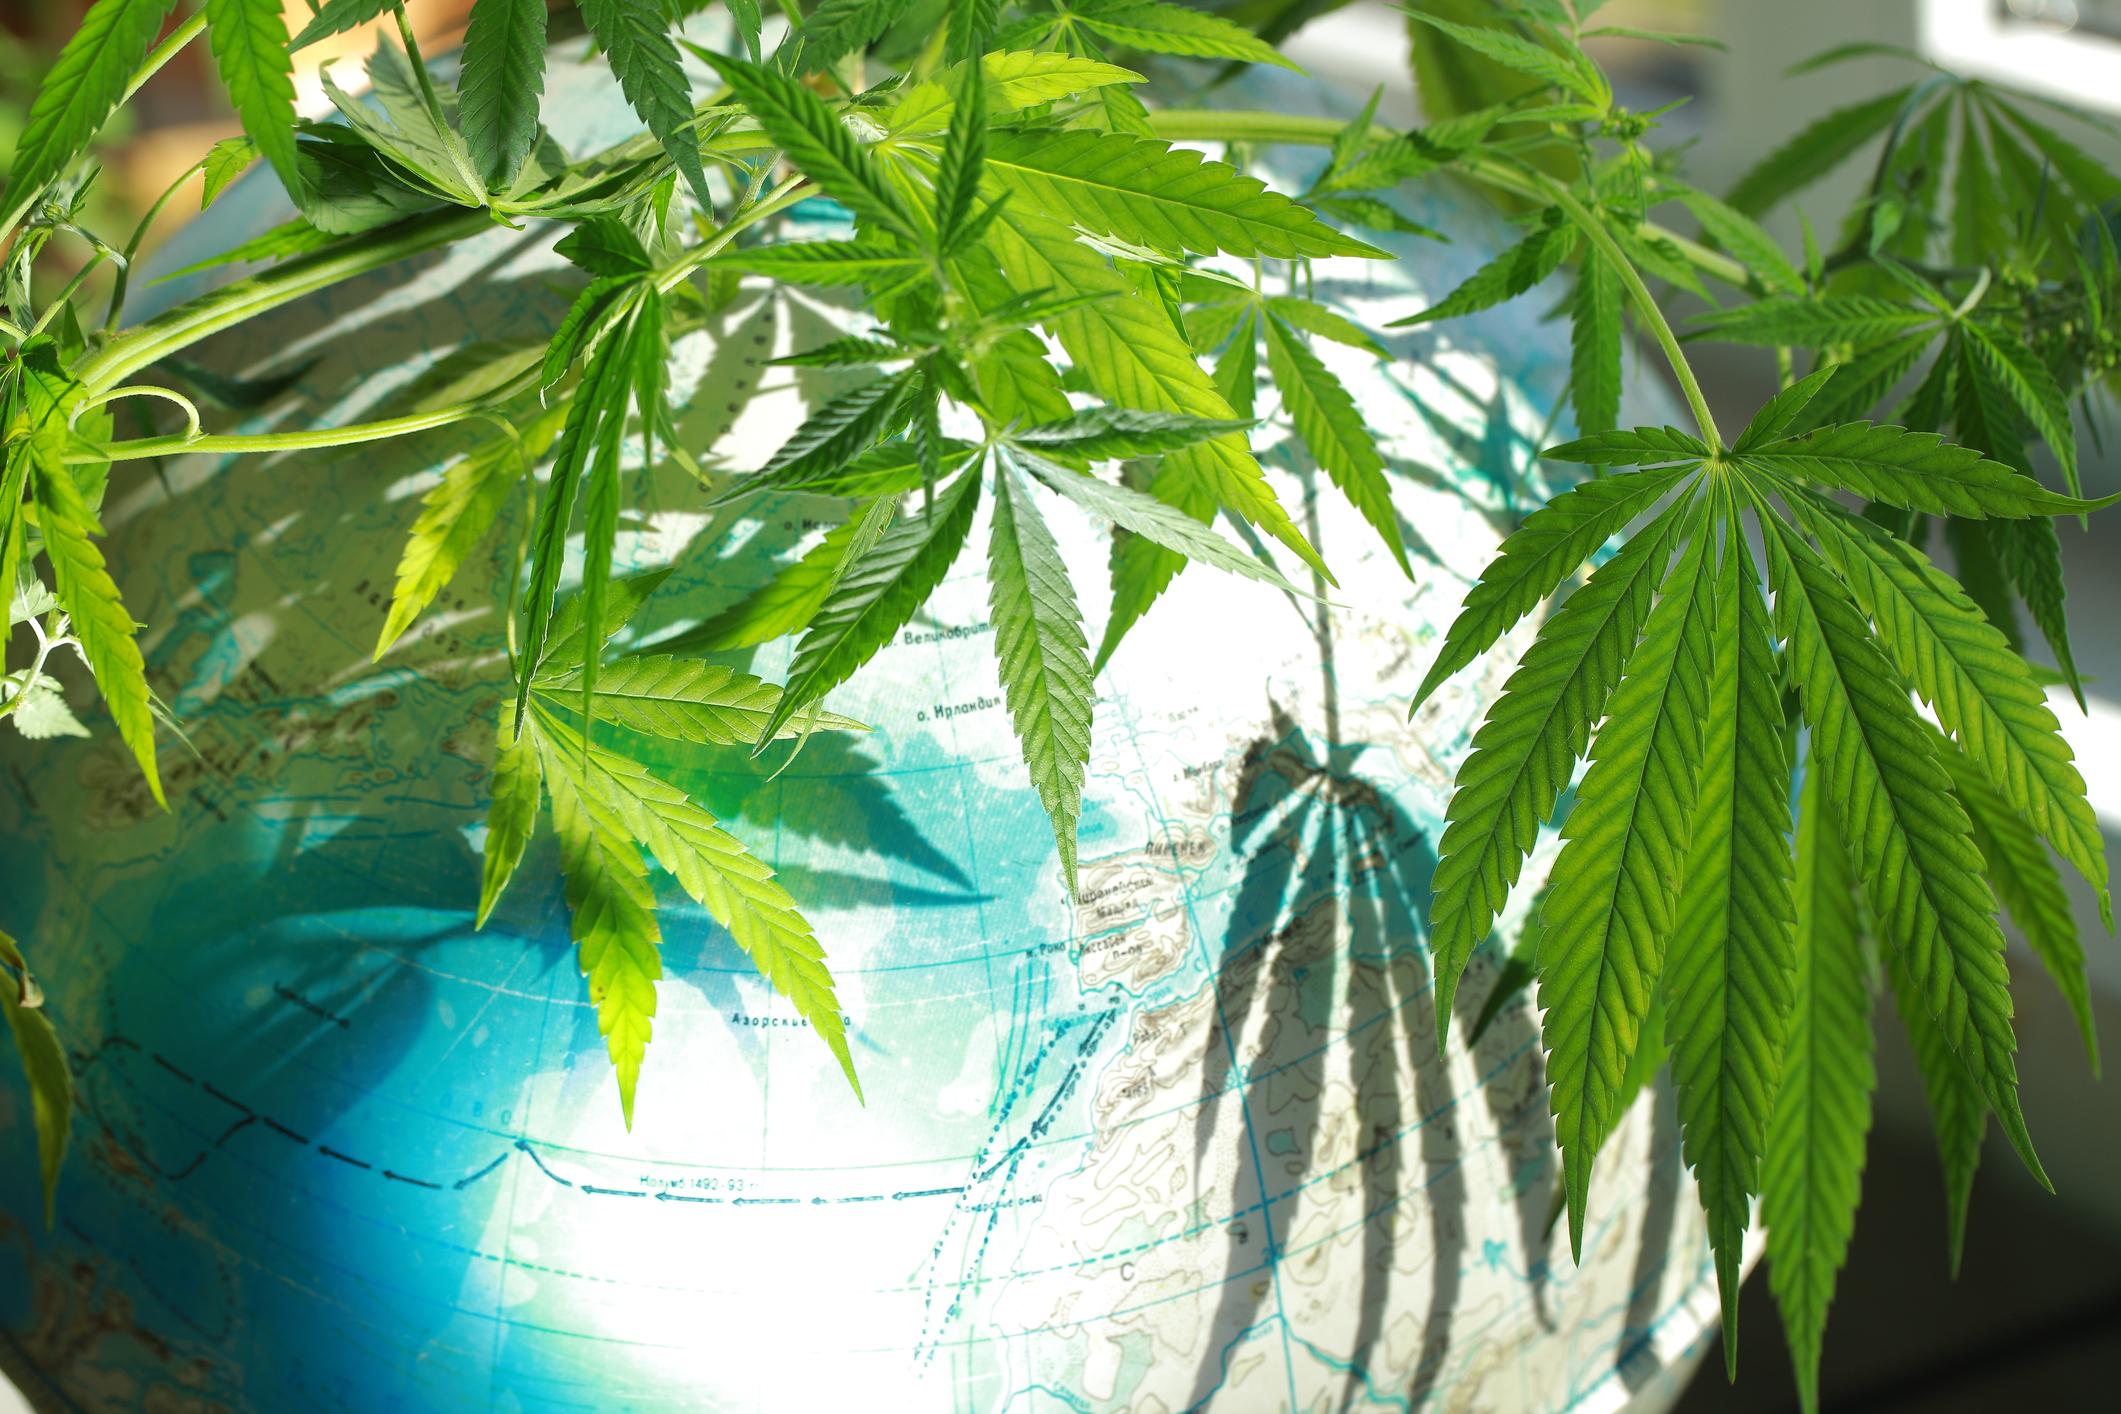 Marijuana covering part of a globe